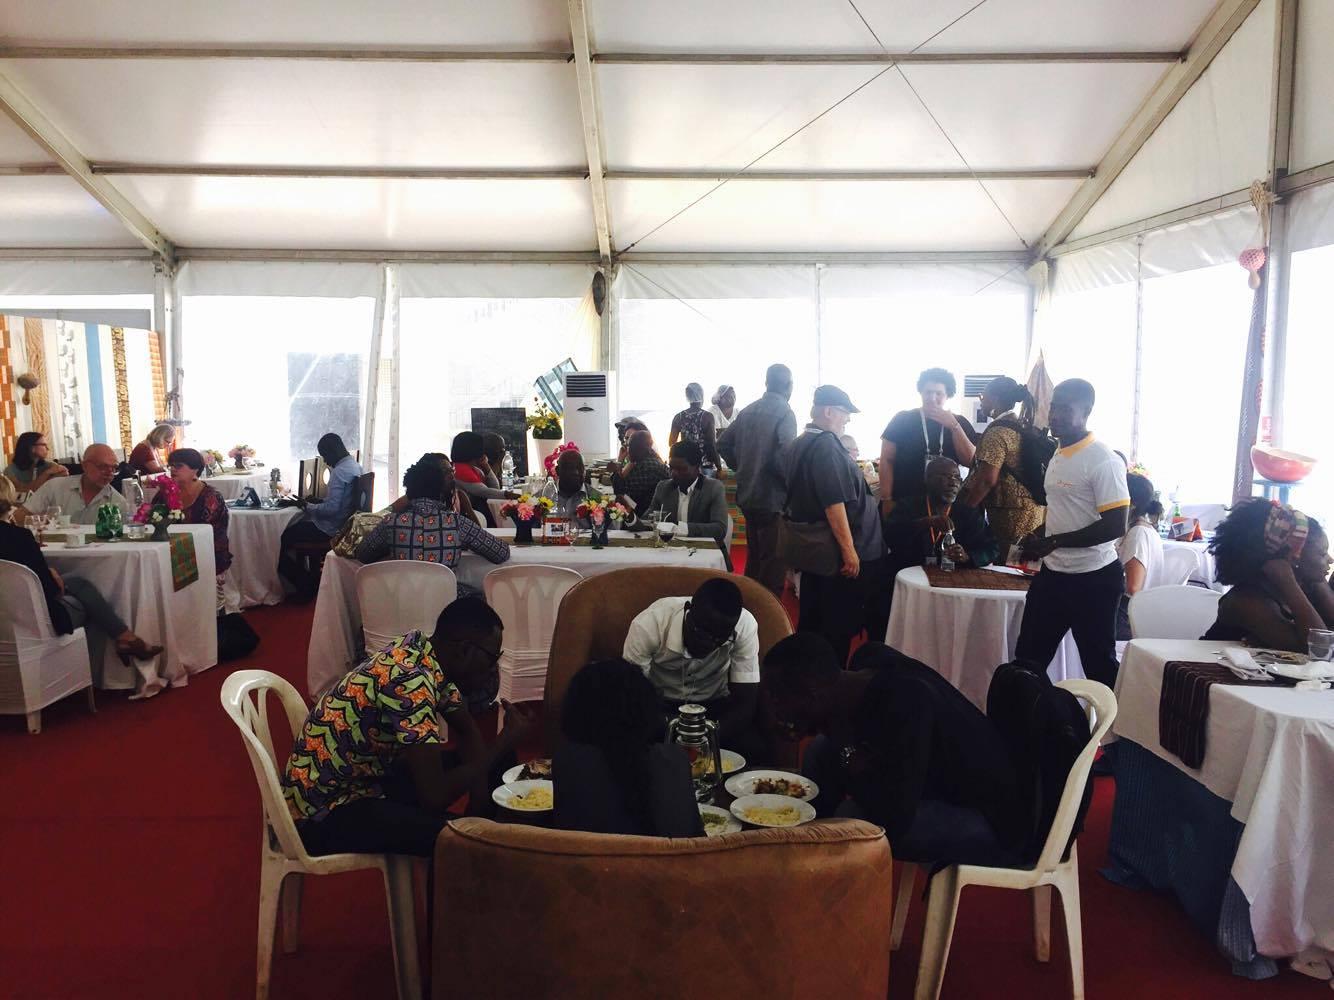 Ambassadeur gastronomique ivoirien au sein des jeux de la francophonie, jeux de la francophonie, restaurant, saveur du terroir, serialfoodie, tripadvisor